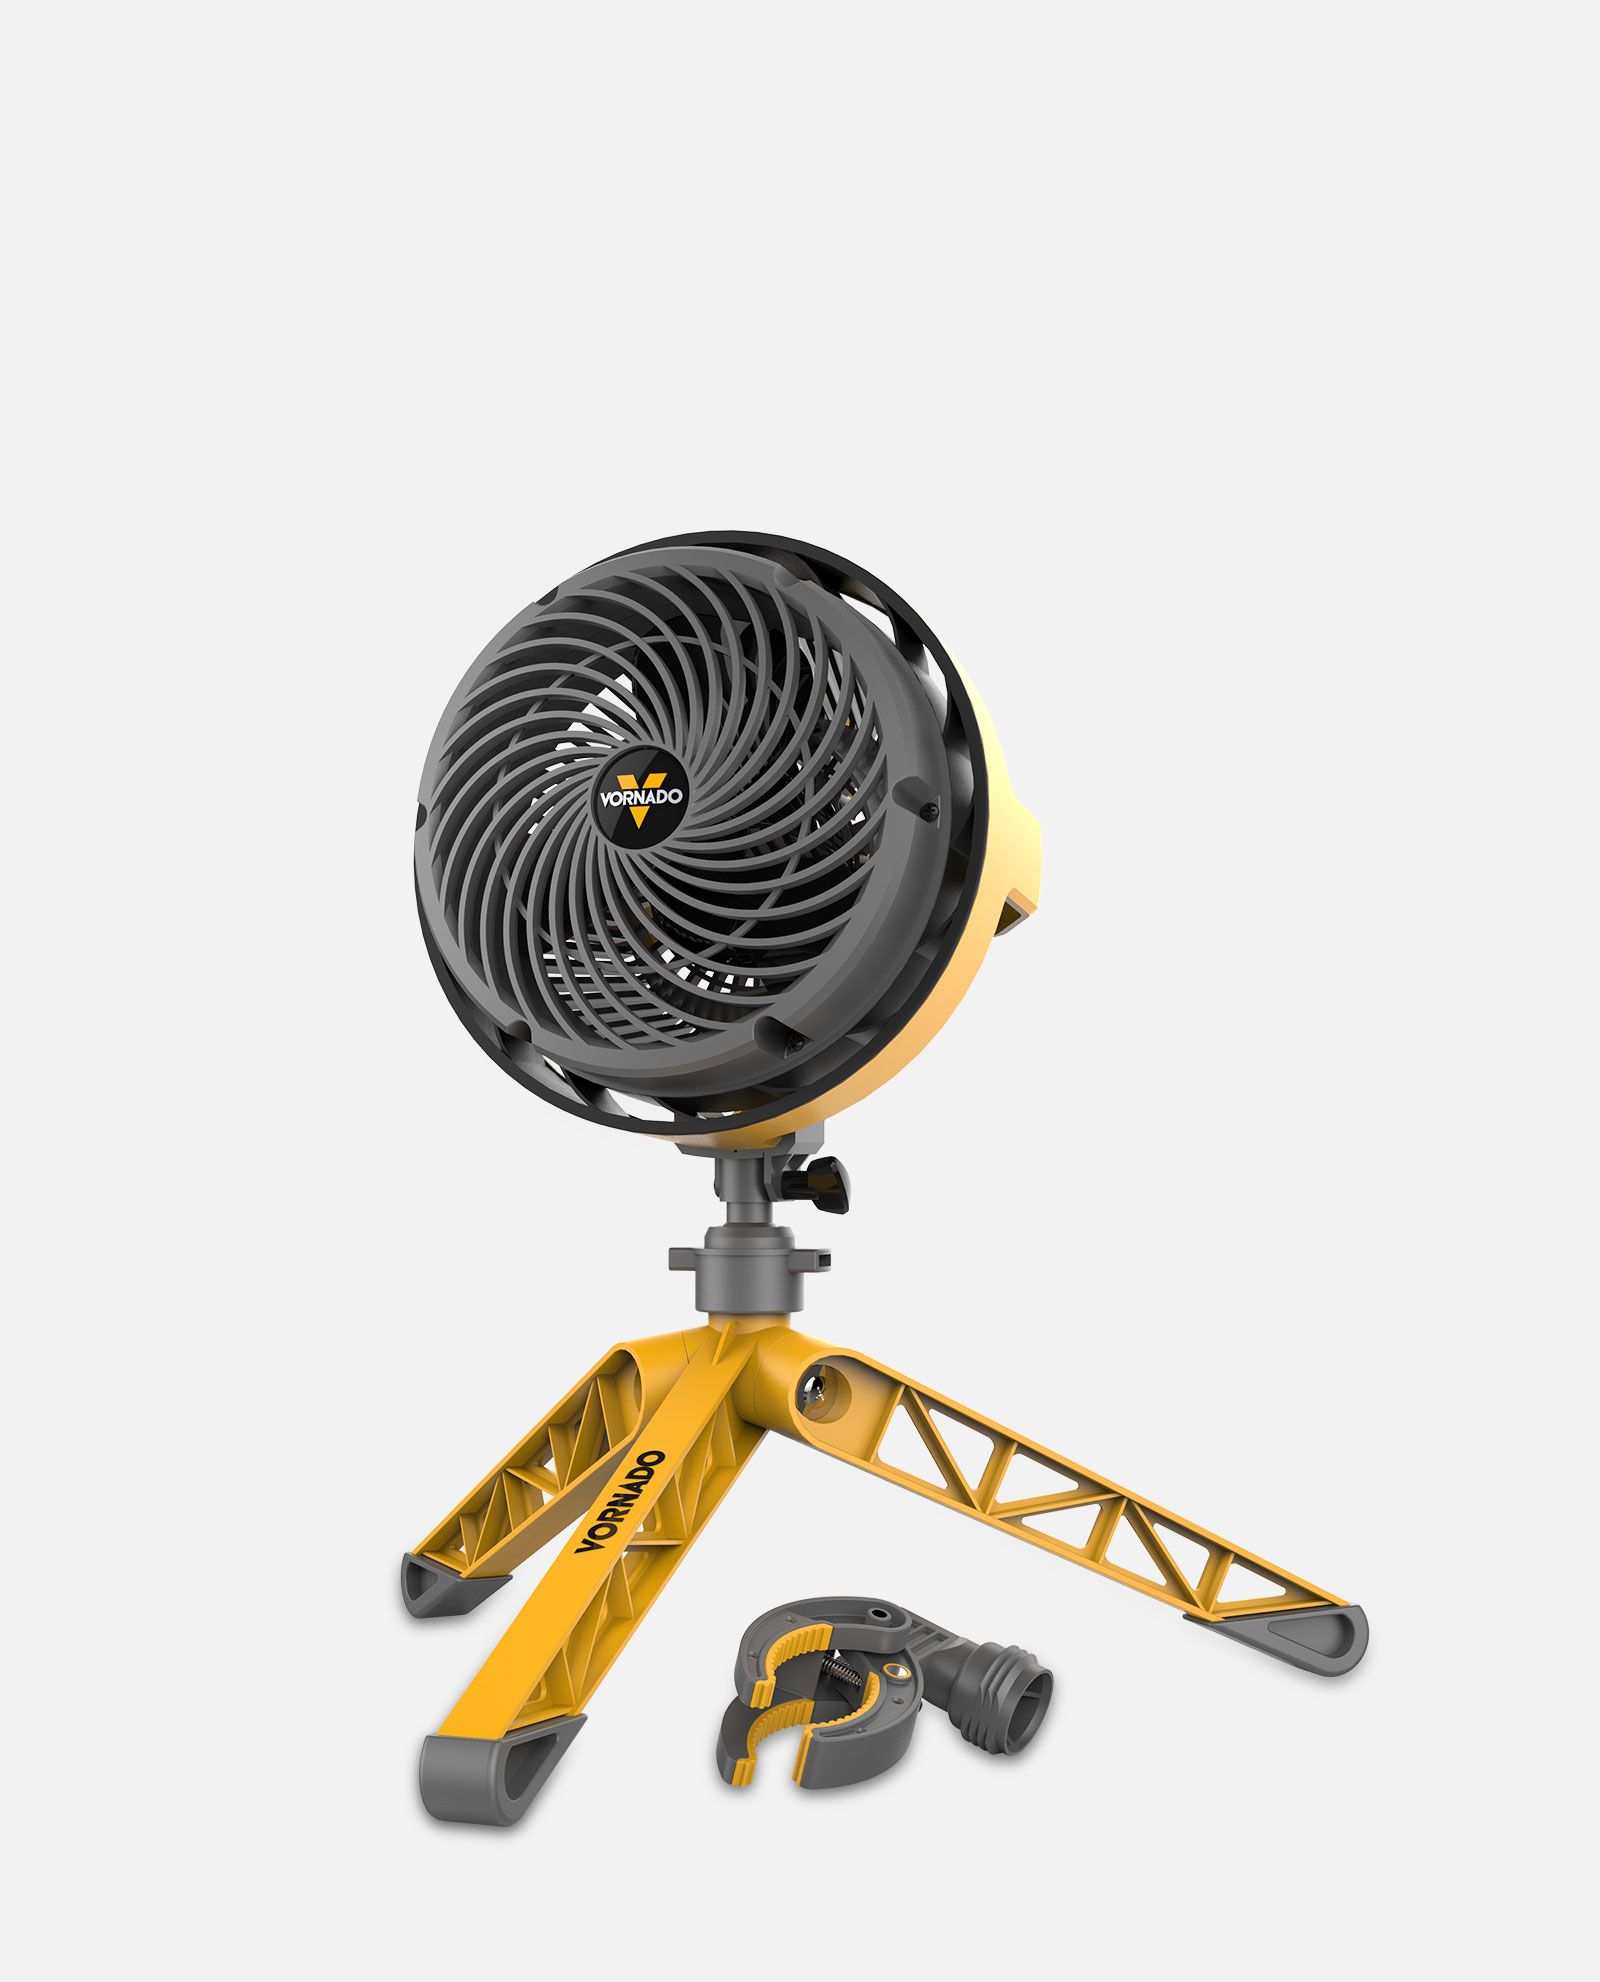 Wiring Diagram For Vornado Vfan Electrical Diagrams Heater Circulators Fans Alternator